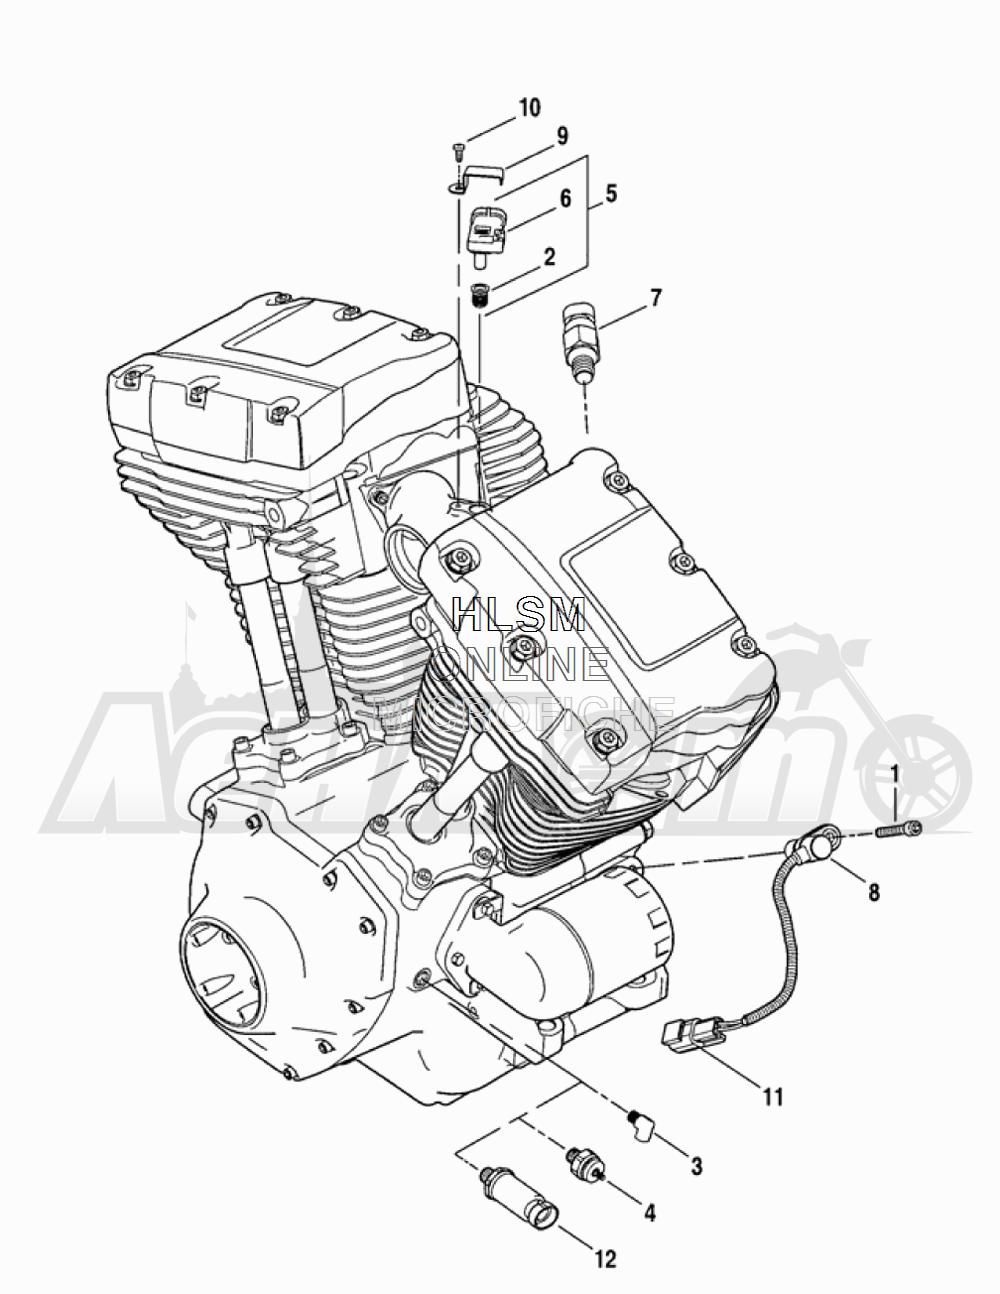 Запчасти для Мотоцикла Harley-Davidson 2005 FLTRI ROAD GLIDE® (INJECTION) (FS) Раздел: ENGINE SENSORS W/ SWITCHES | двигатель датчики вместе с выключатели, переключатели